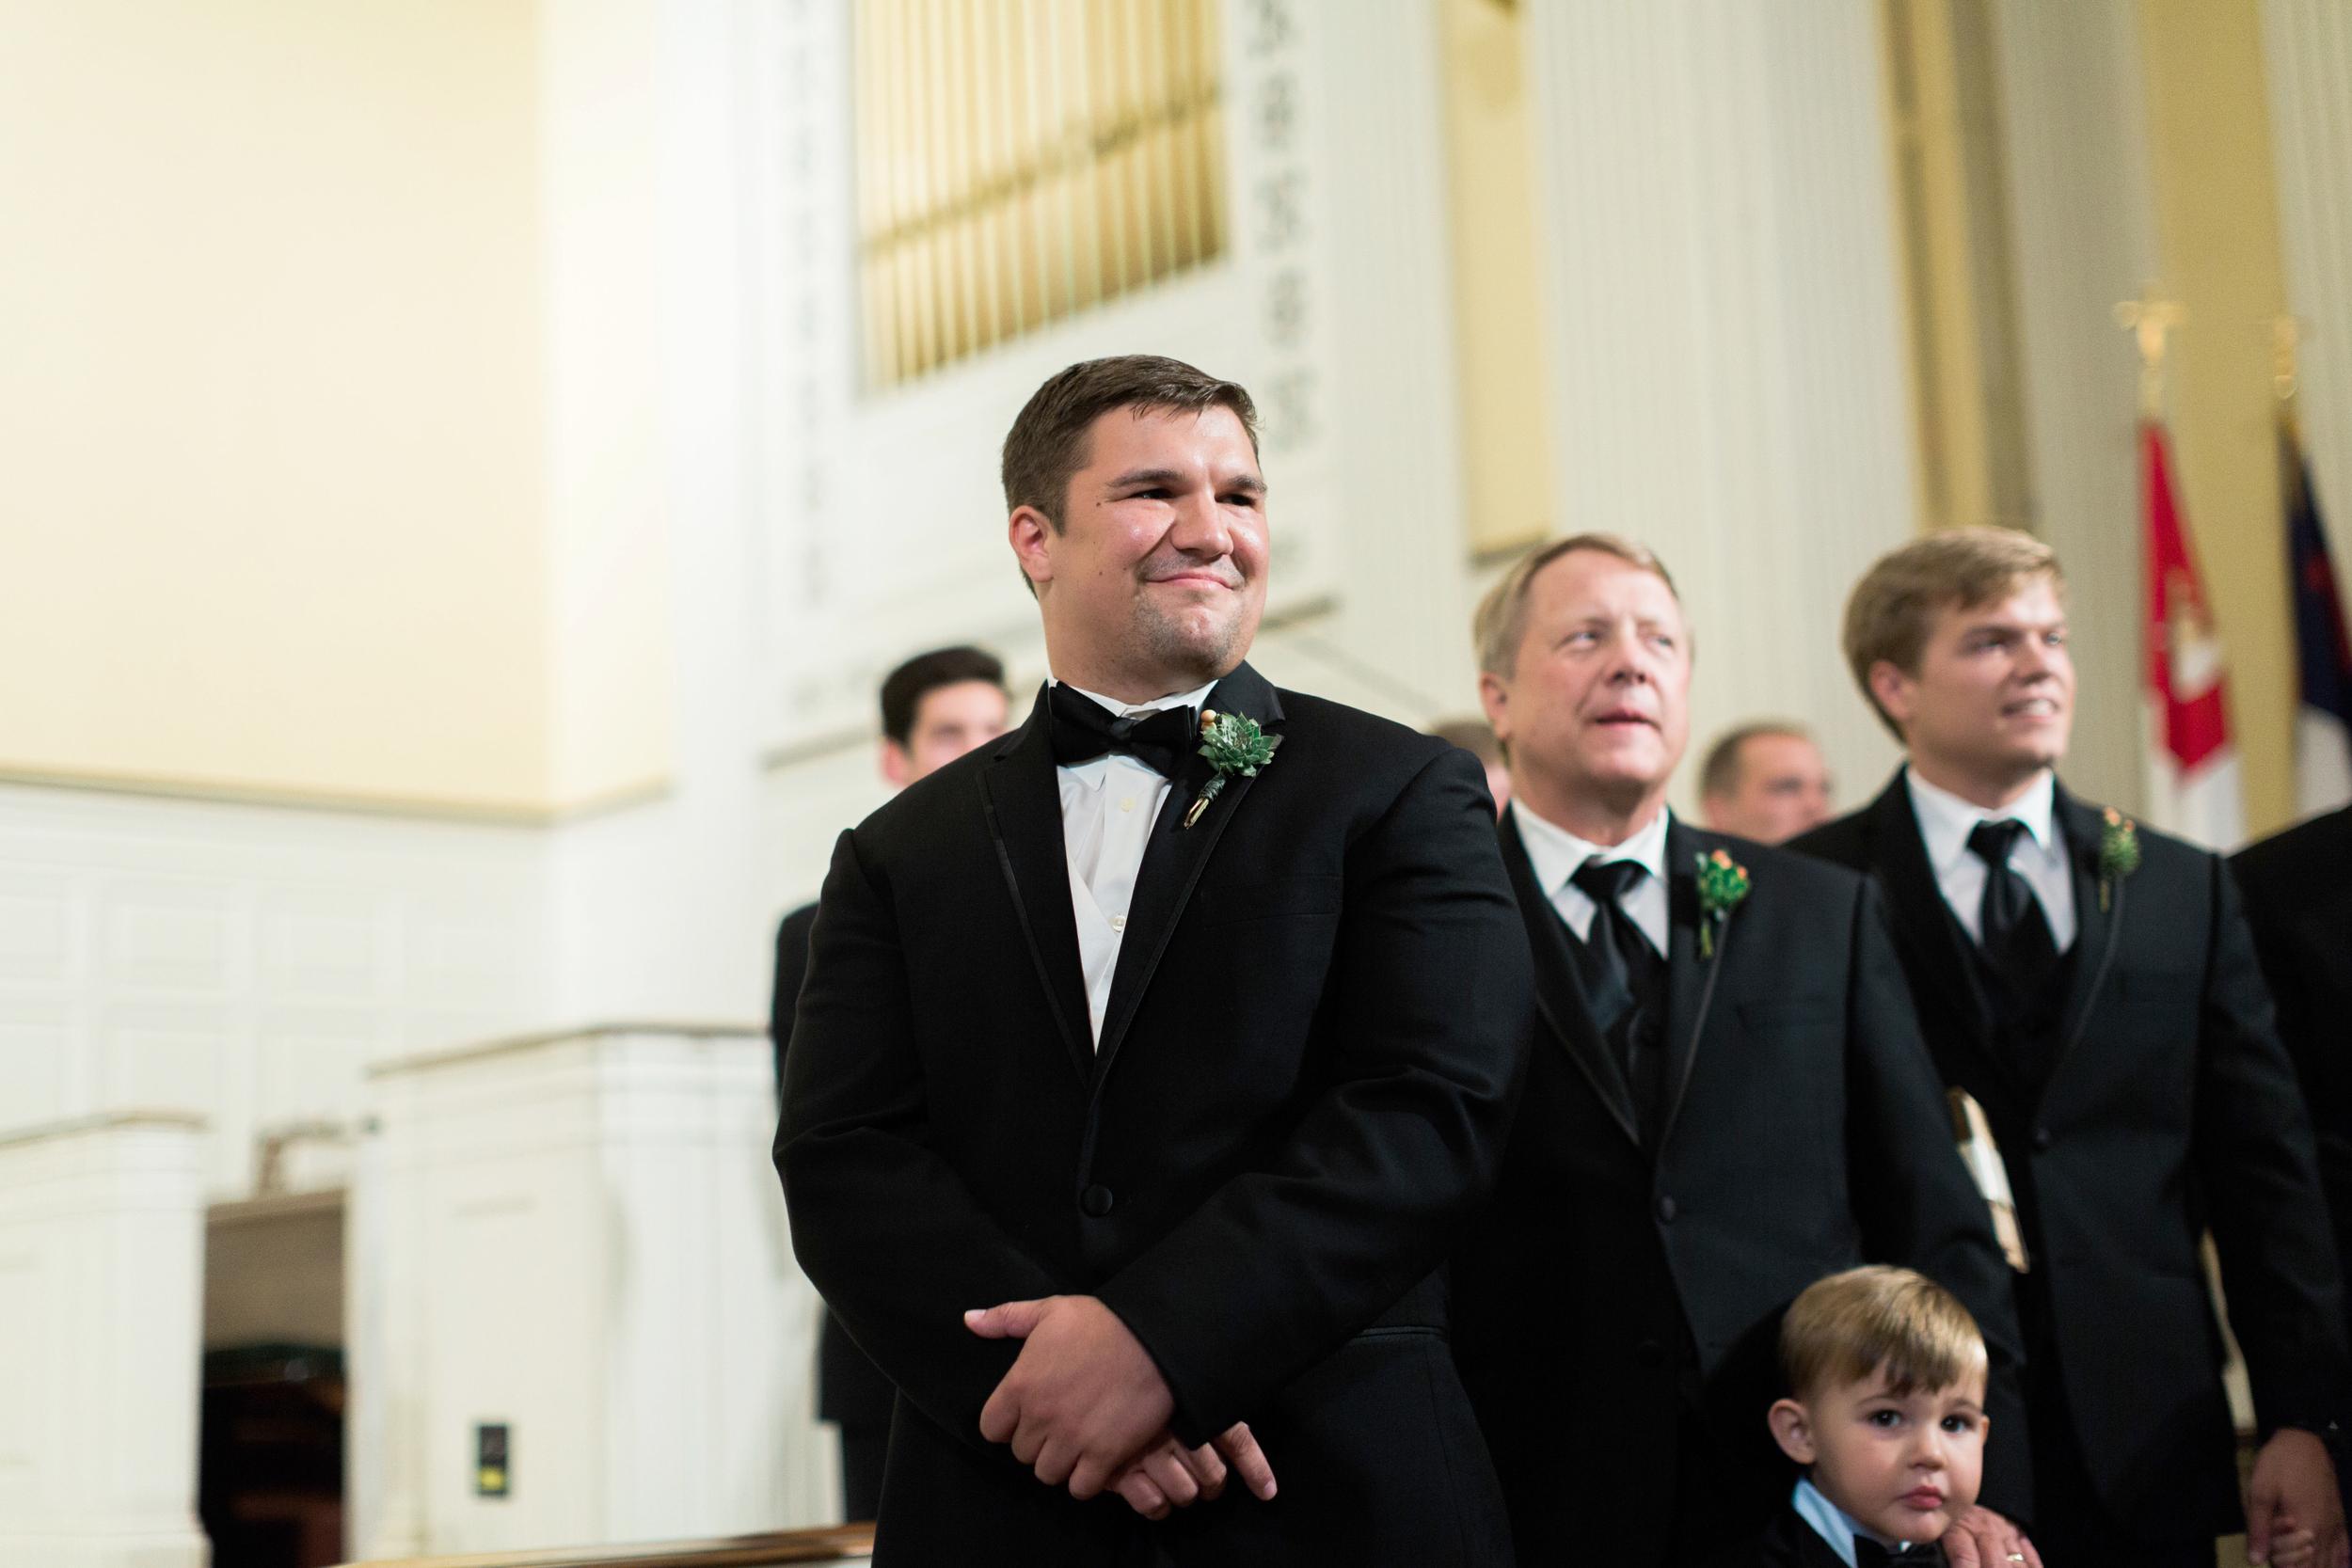 Brewbaker-Wedding-Montgomery-Alabama-Nick-Drollette-116.jpg